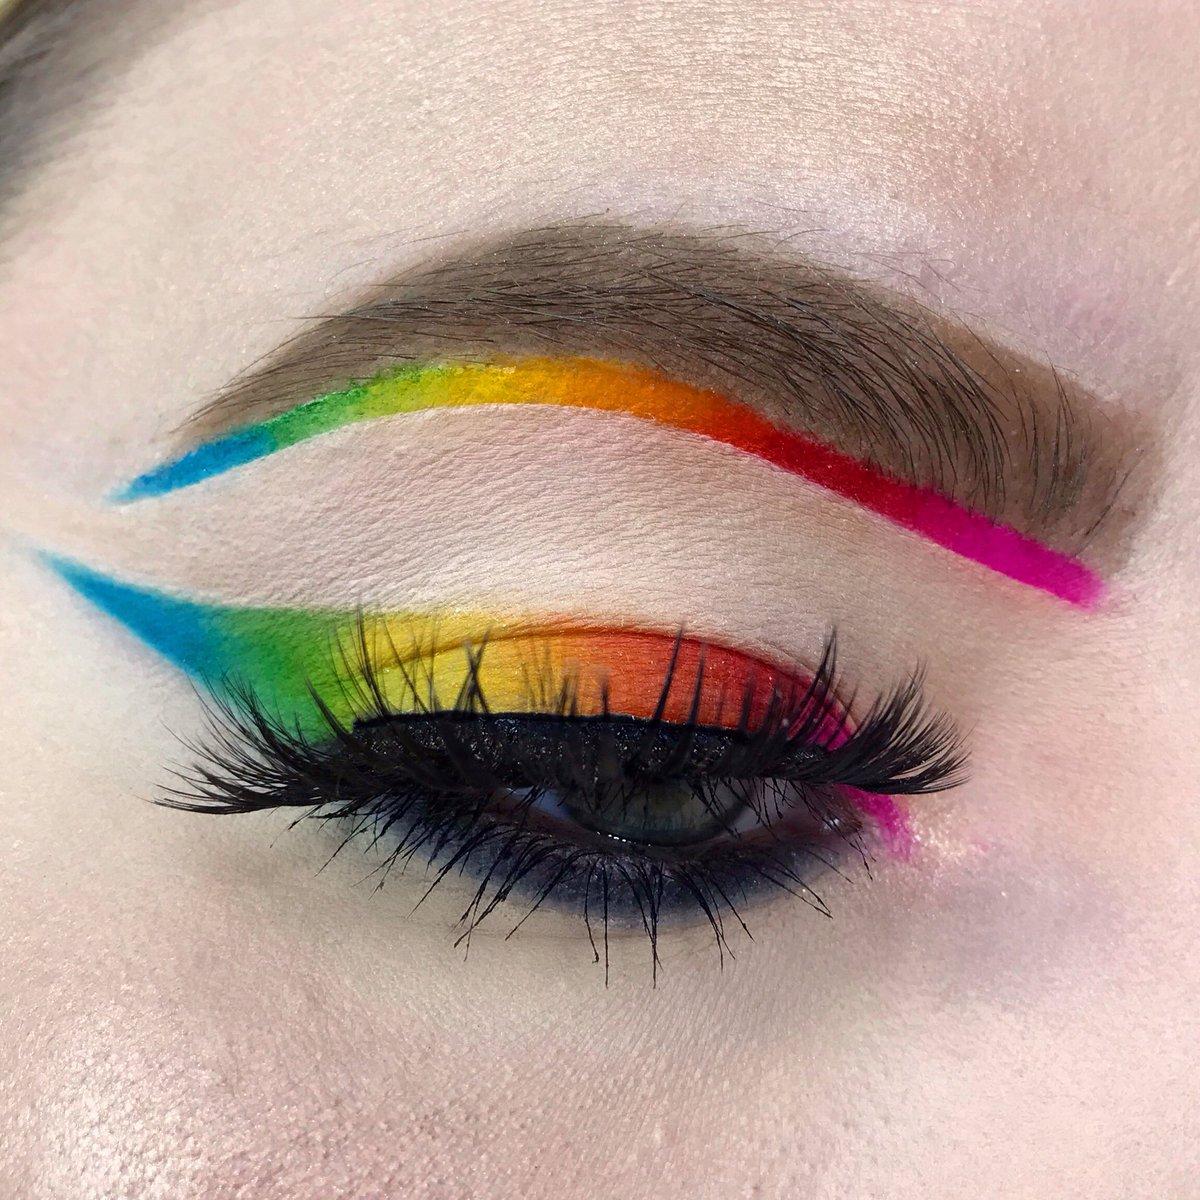 fe5ad7e5187 rainboweyeshadow hashtag on Twitter